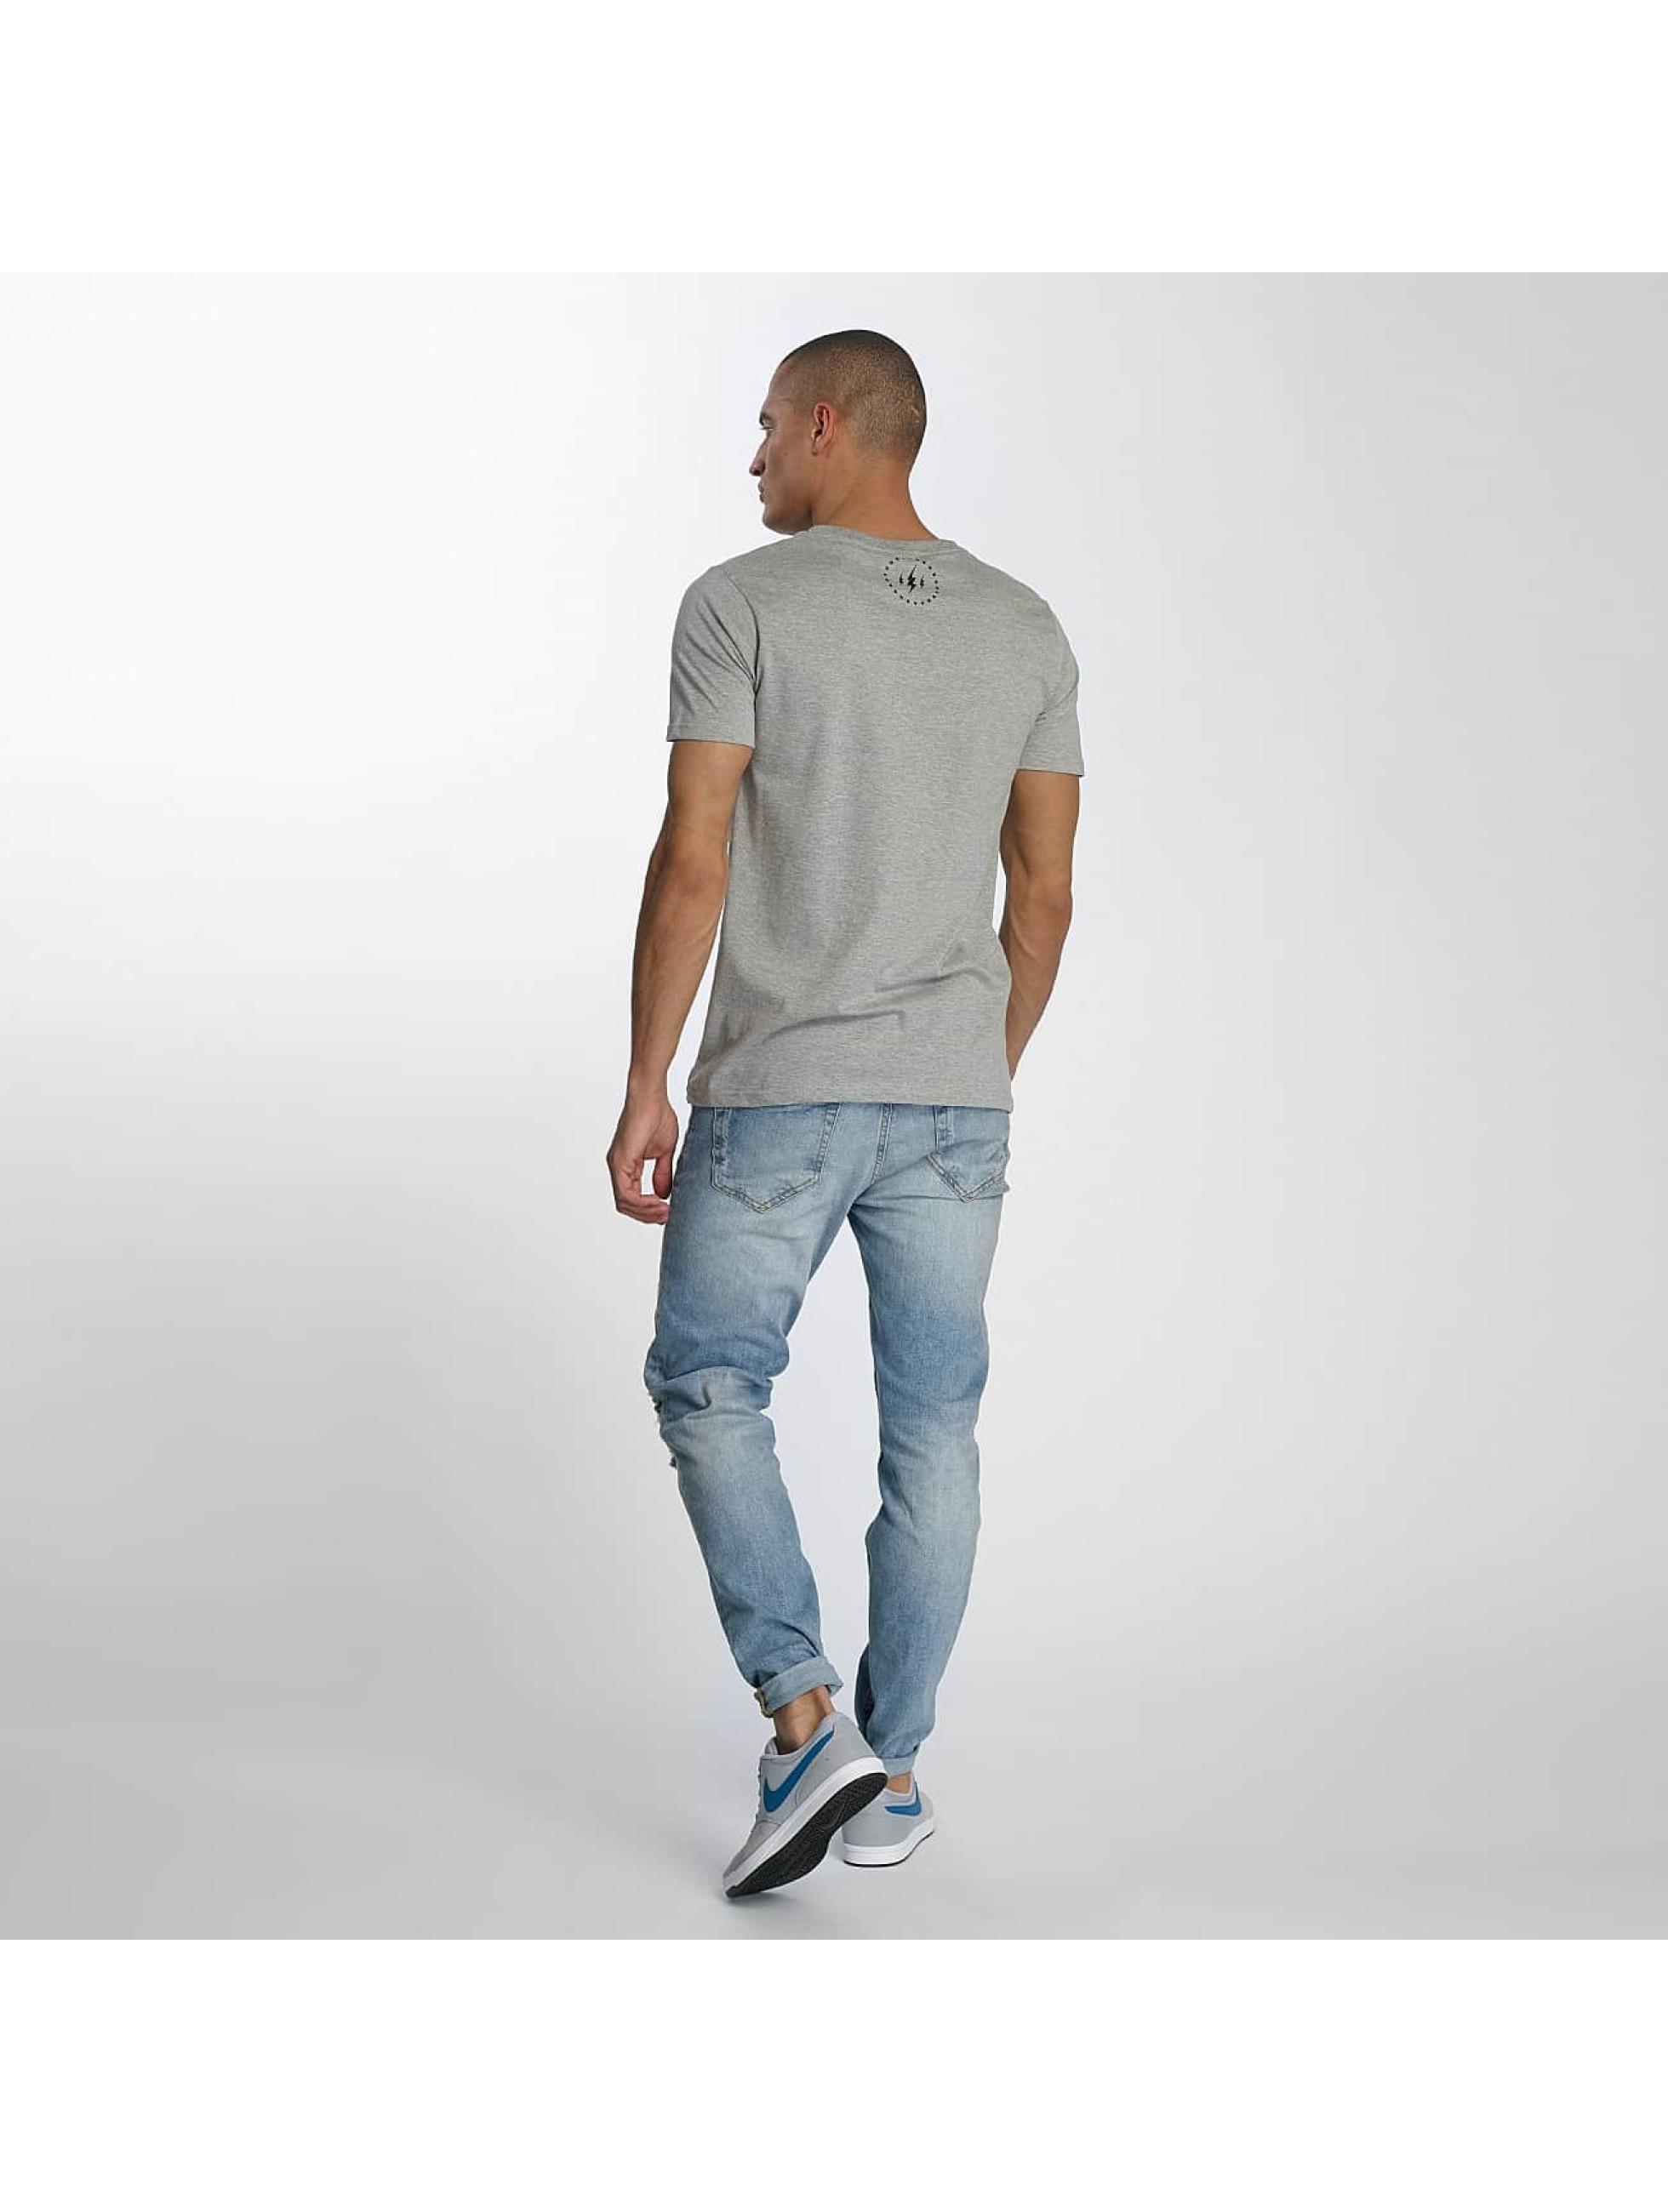 TrueSpin t-shirt 1 grijs